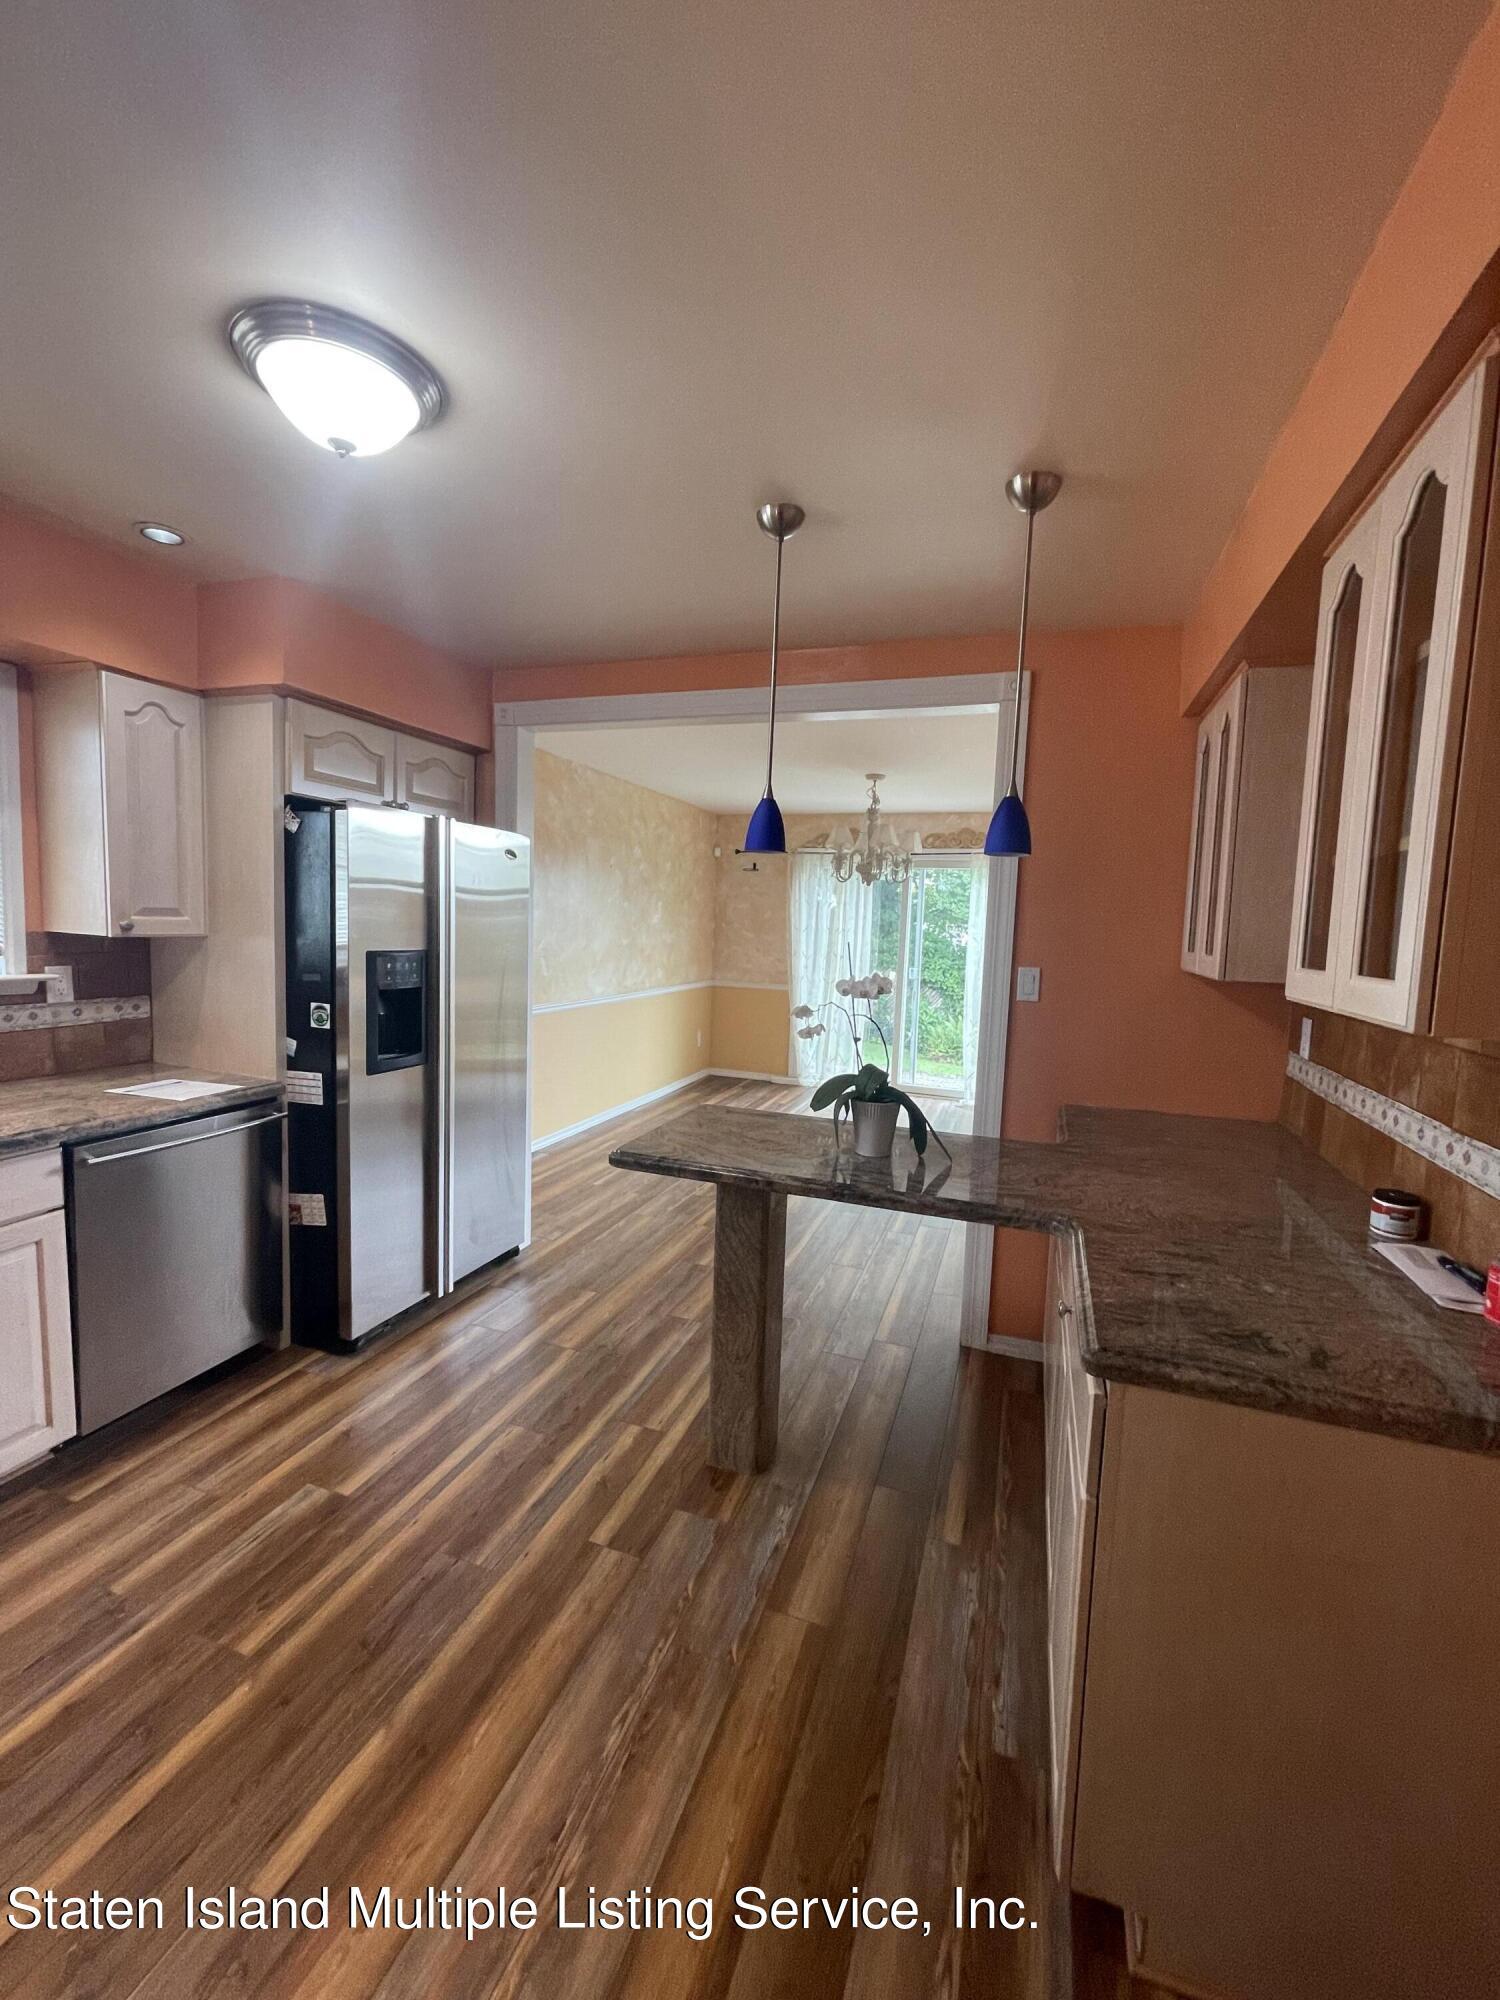 Single Family - Detached 484 Mountainview Avenue  Staten Island, NY 10314, MLS-1147175-43